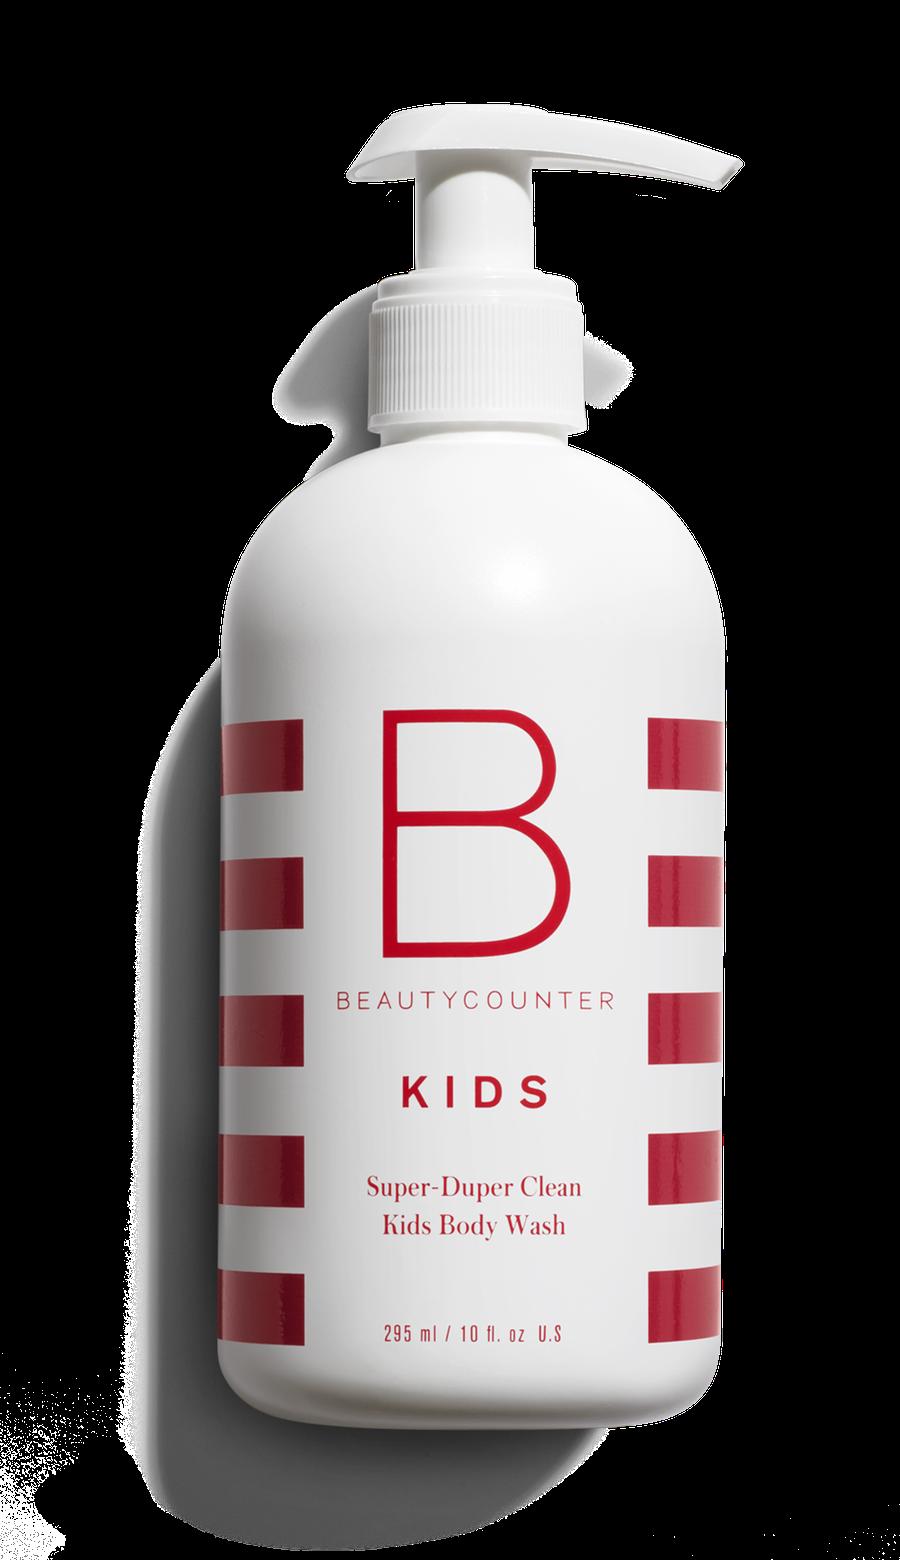 beautycounter-kids-bodywash.png